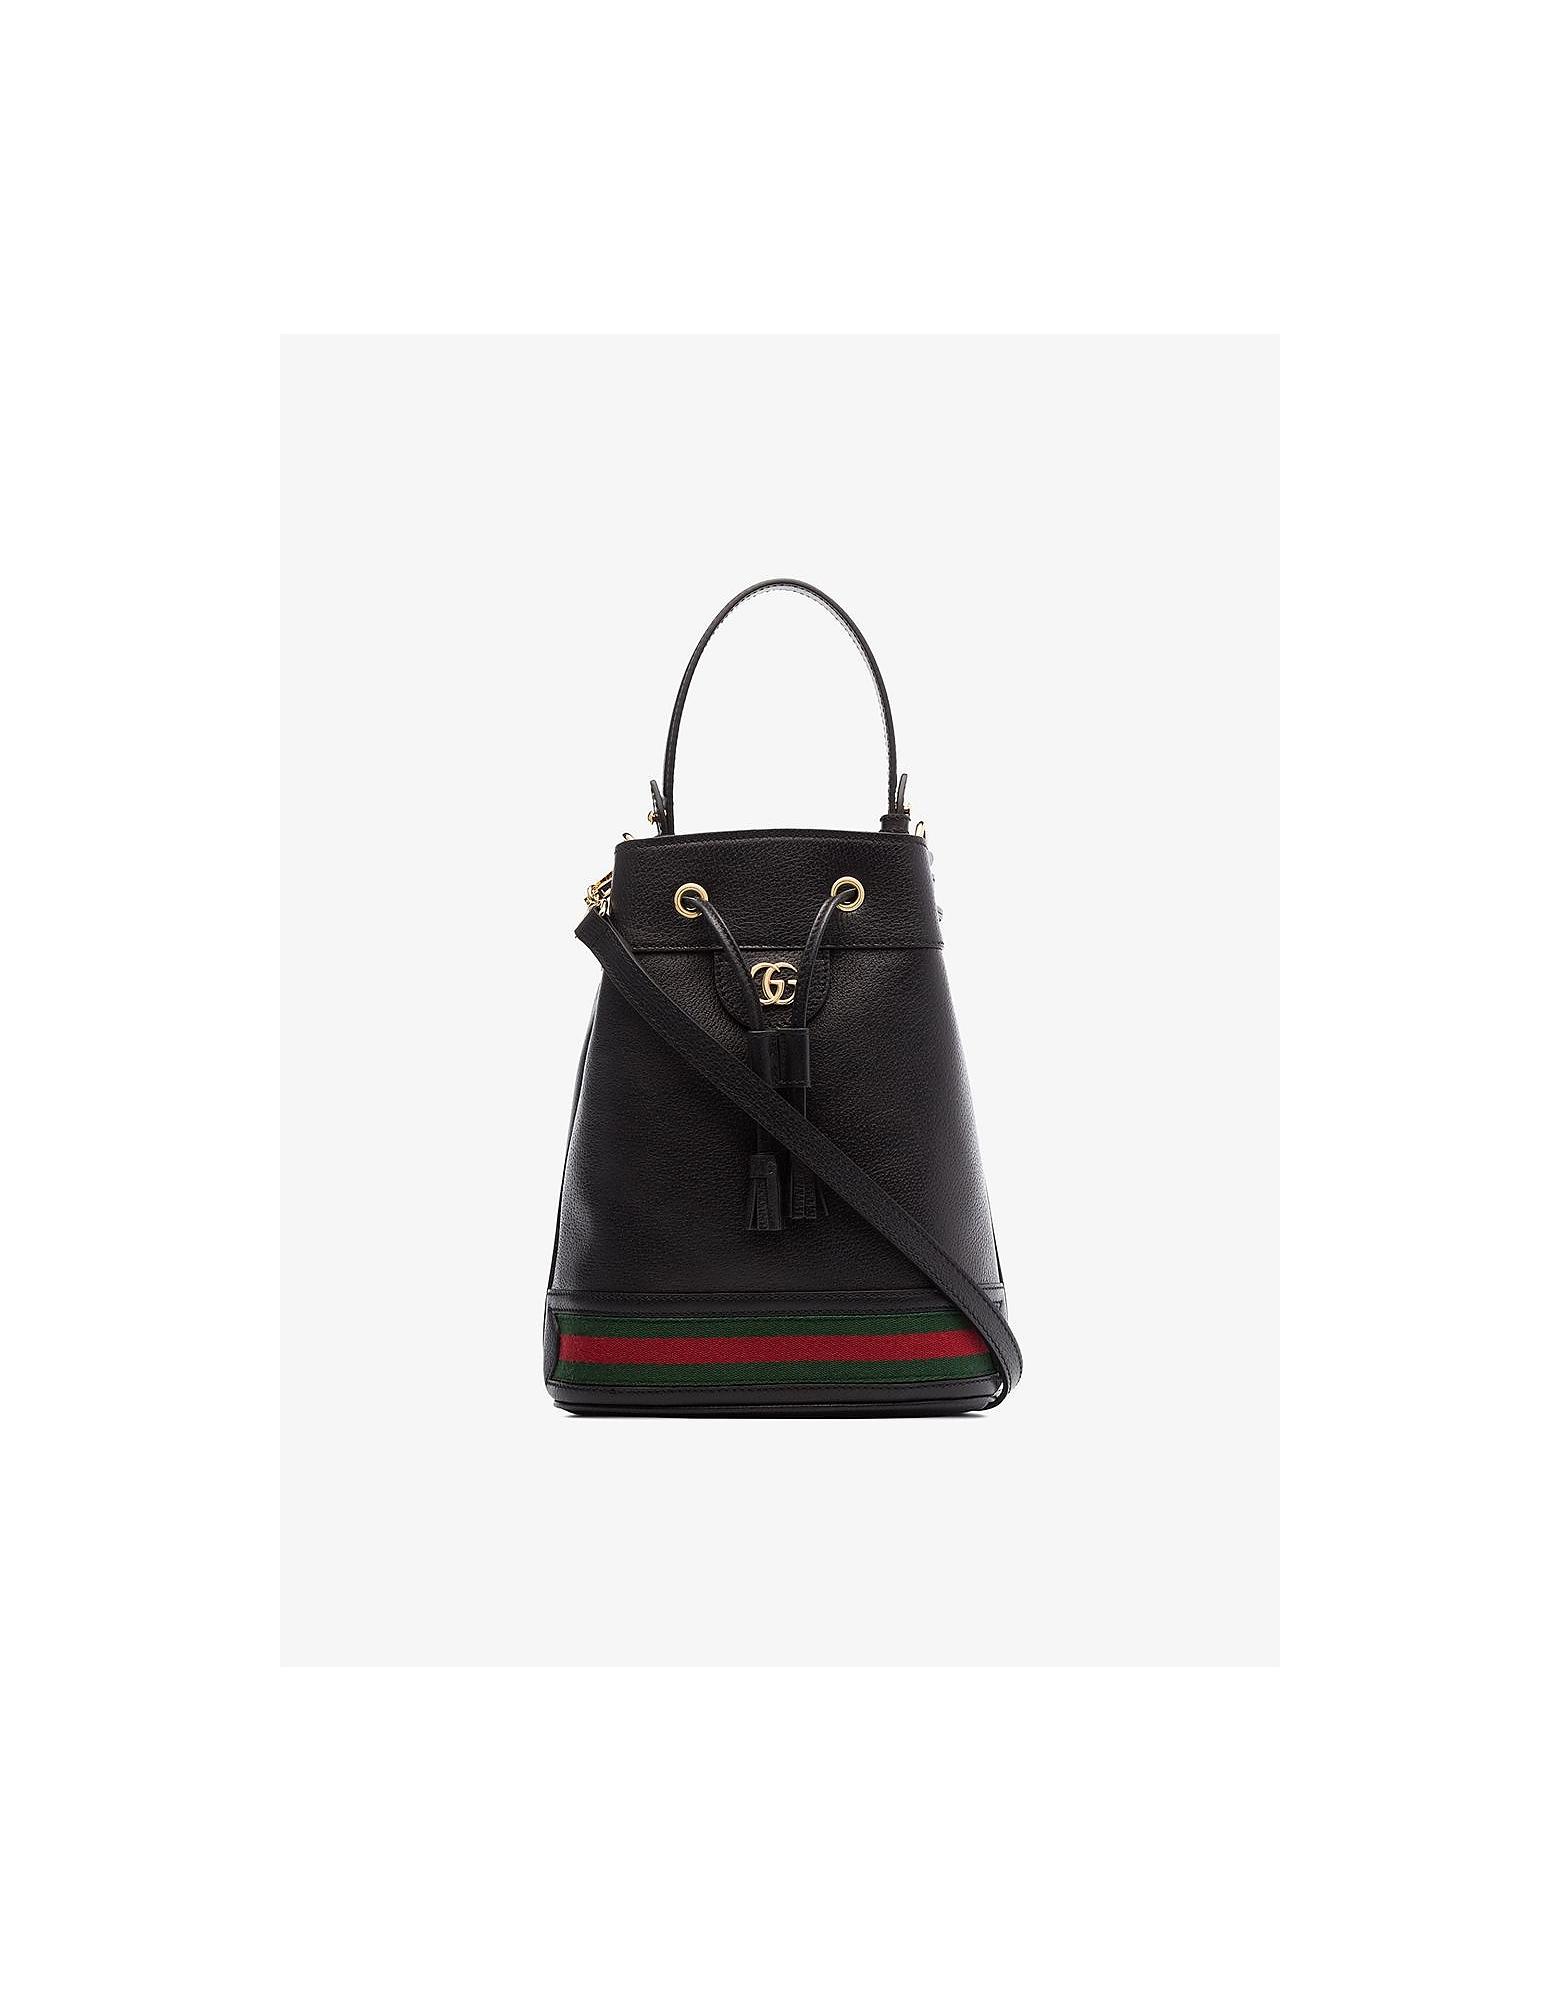 Gucci Designer Handbags, Ophidia bucket bag